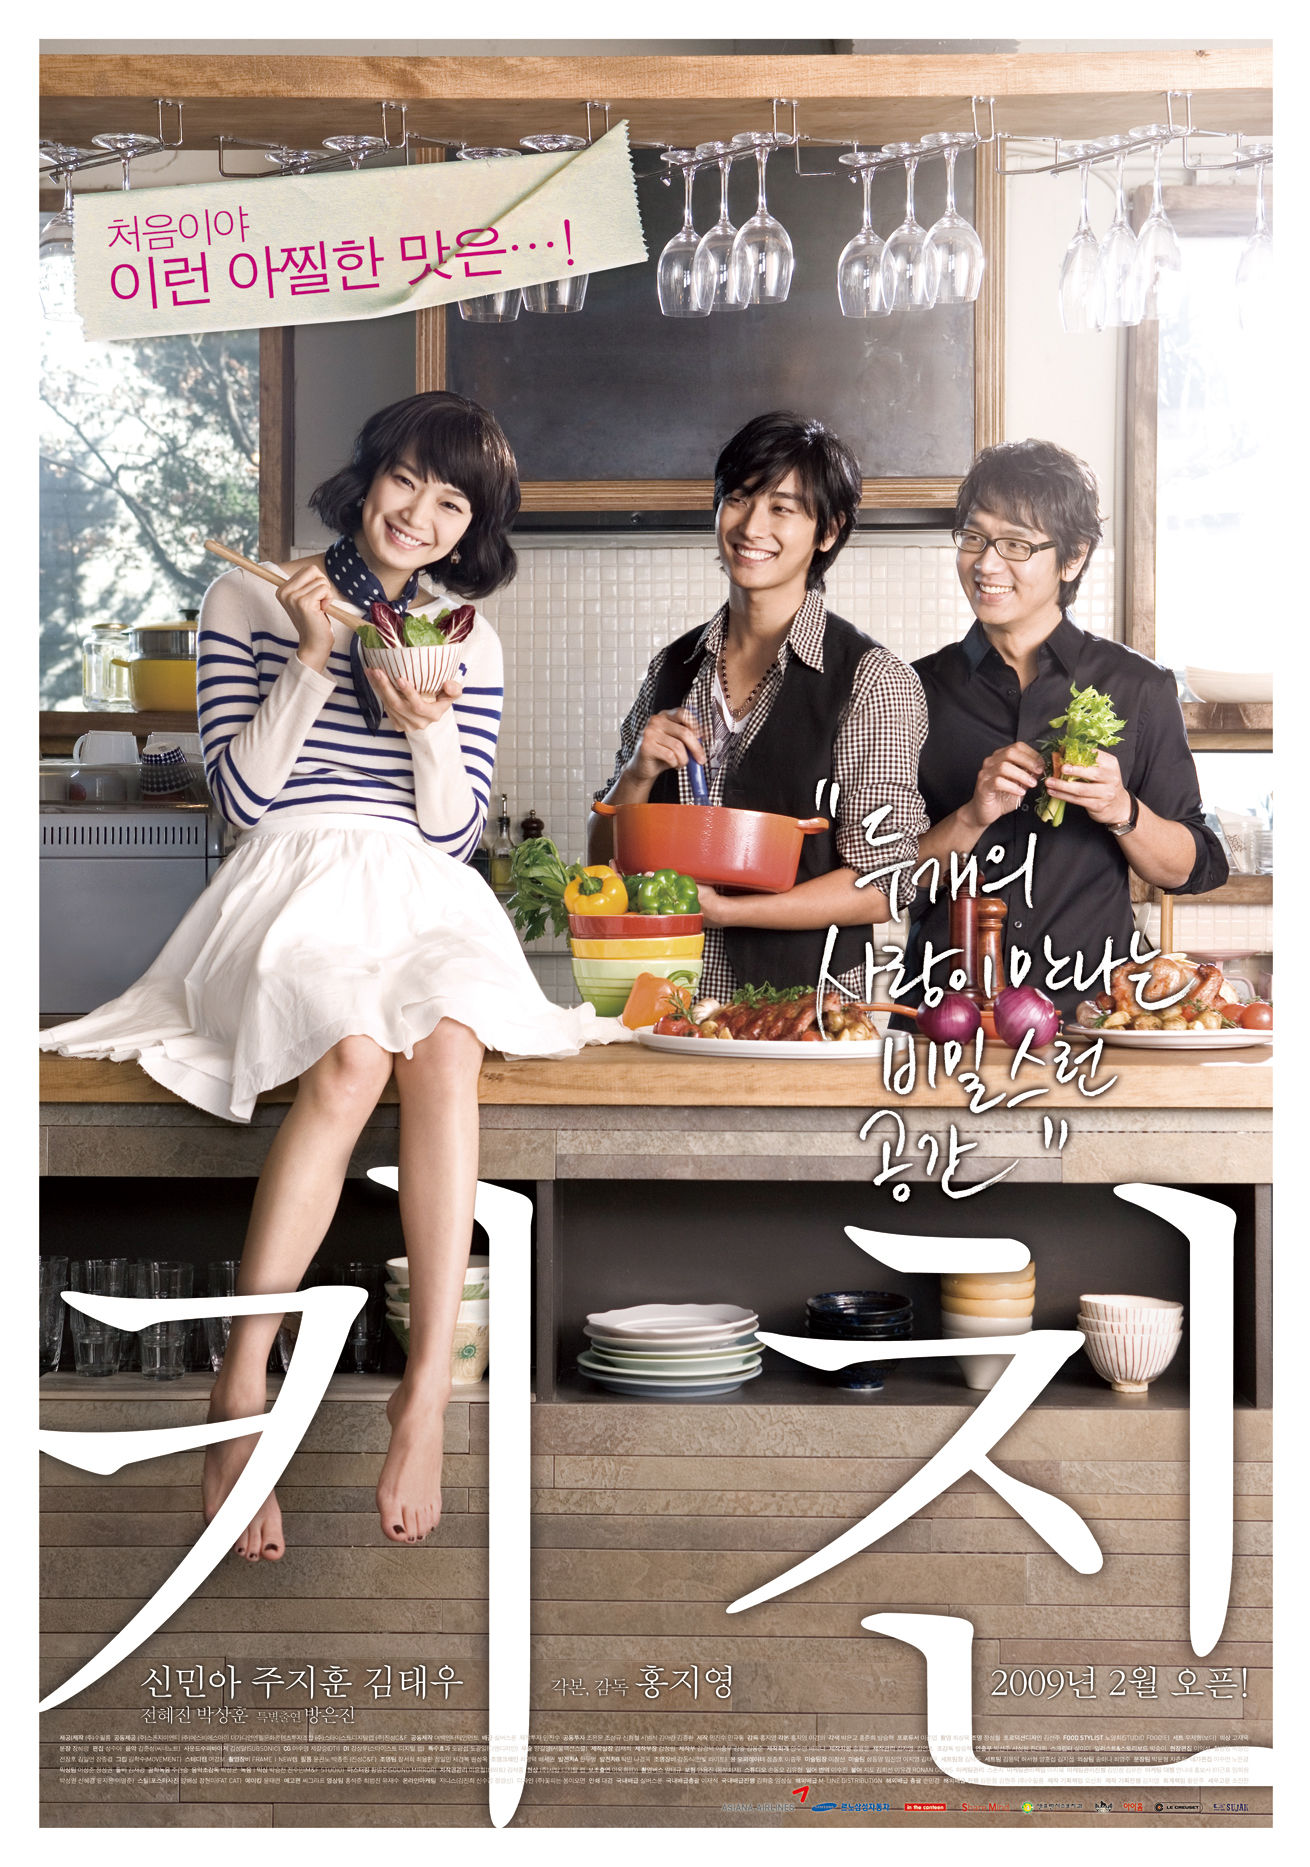 M0010004_poster.jpg